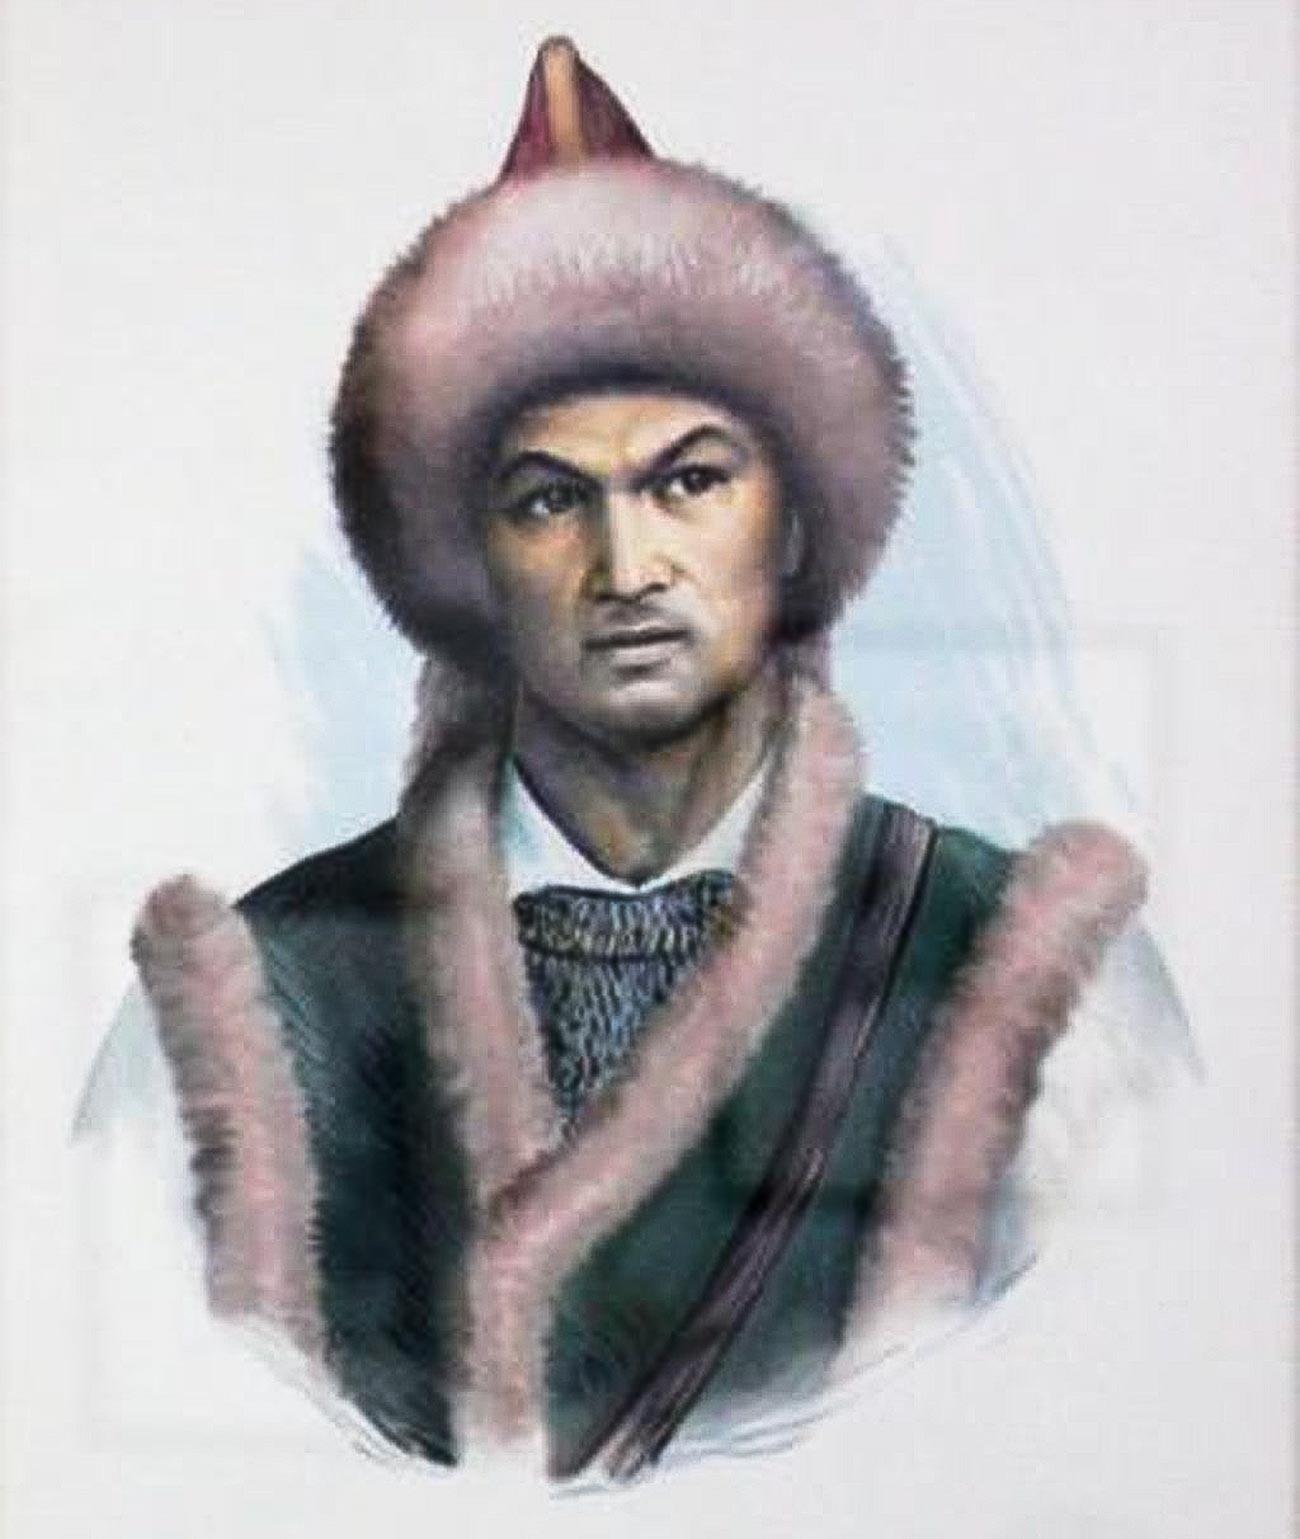 F. Islakhov, ritratto di Salavat Julaev